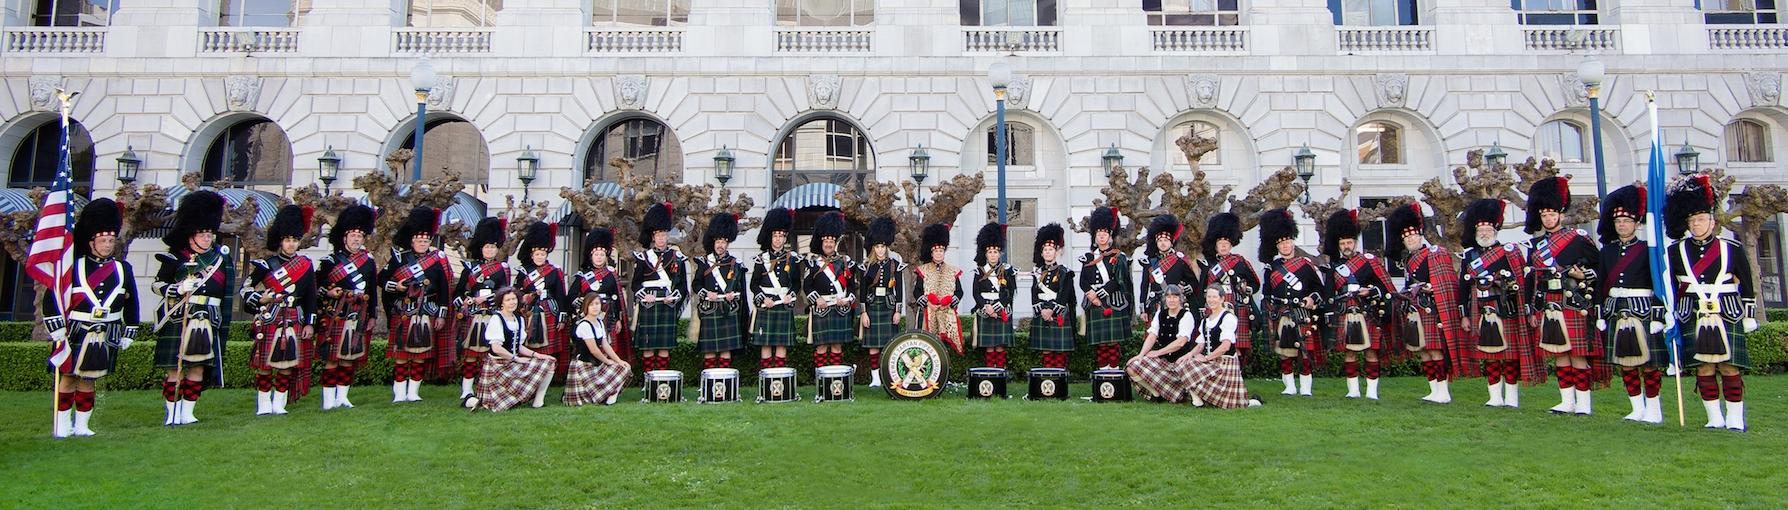 2014 St Patrick's Day Parade